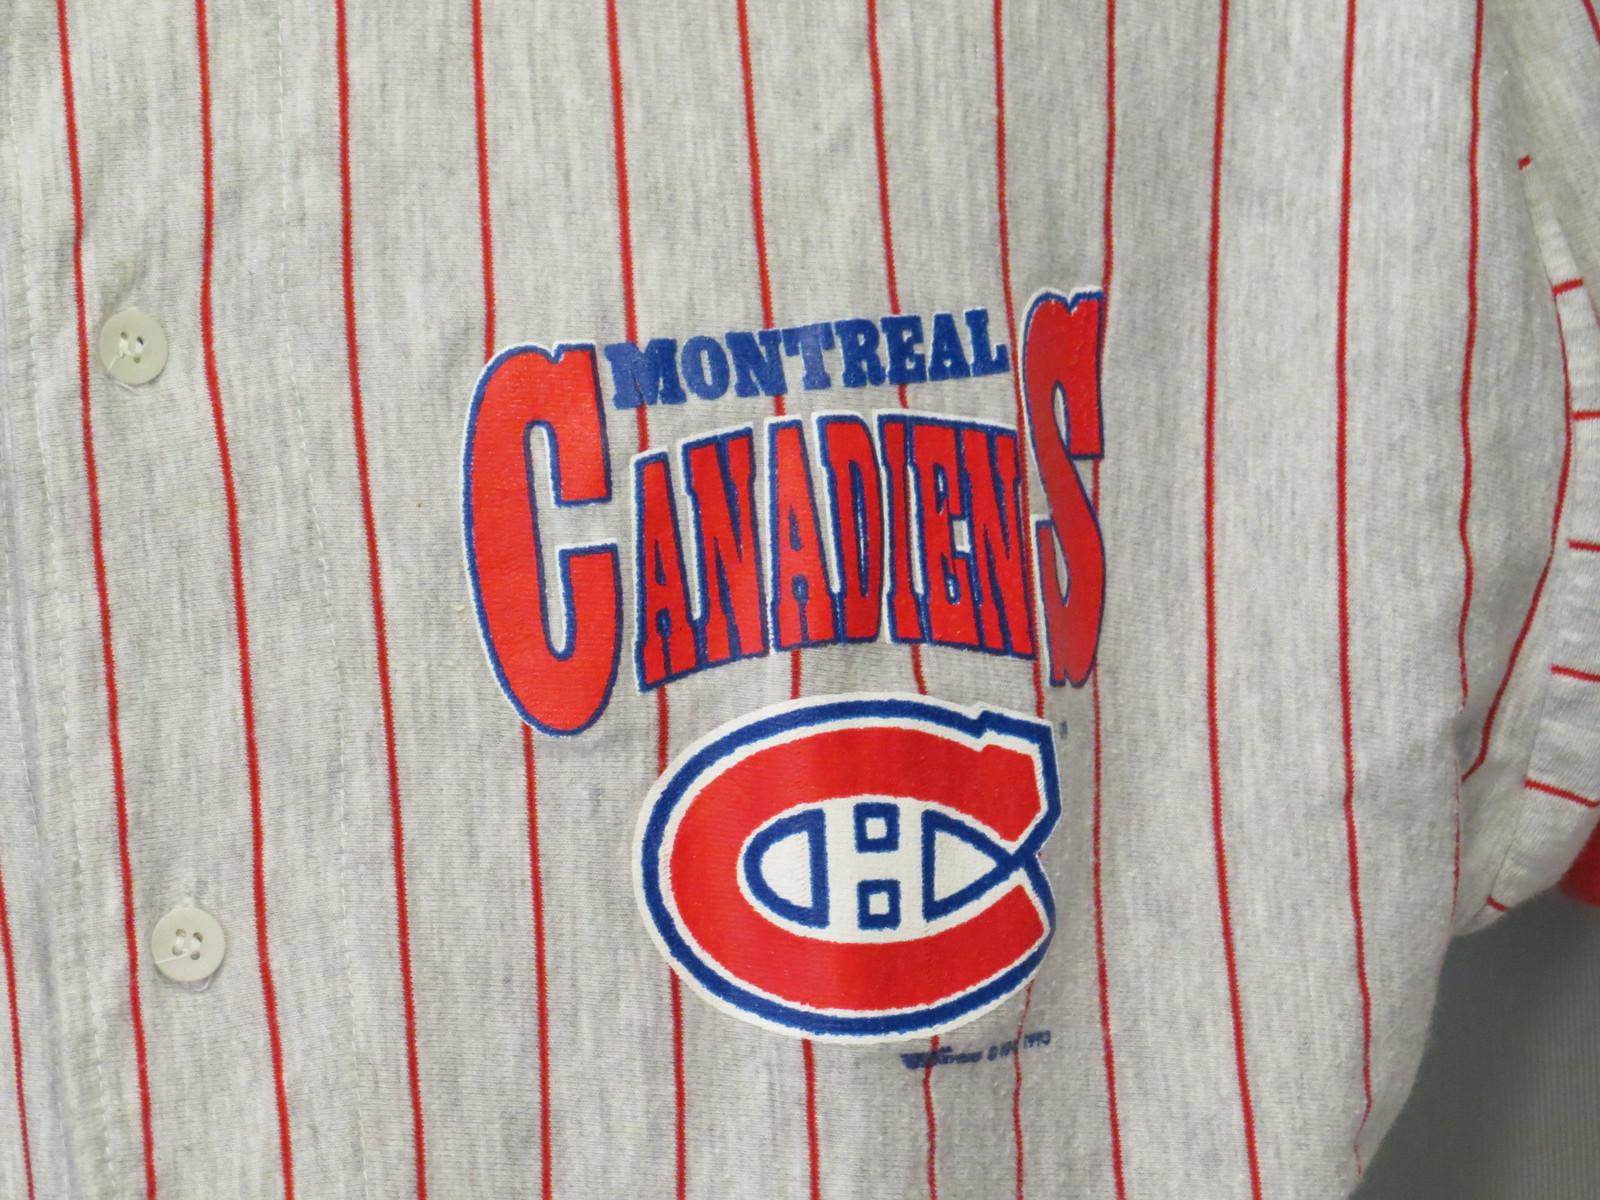 Montreal Canadiens Baseball Jersey - Pin Stripe by Ravens Knit - Men s  Medium 5ed2bed6e